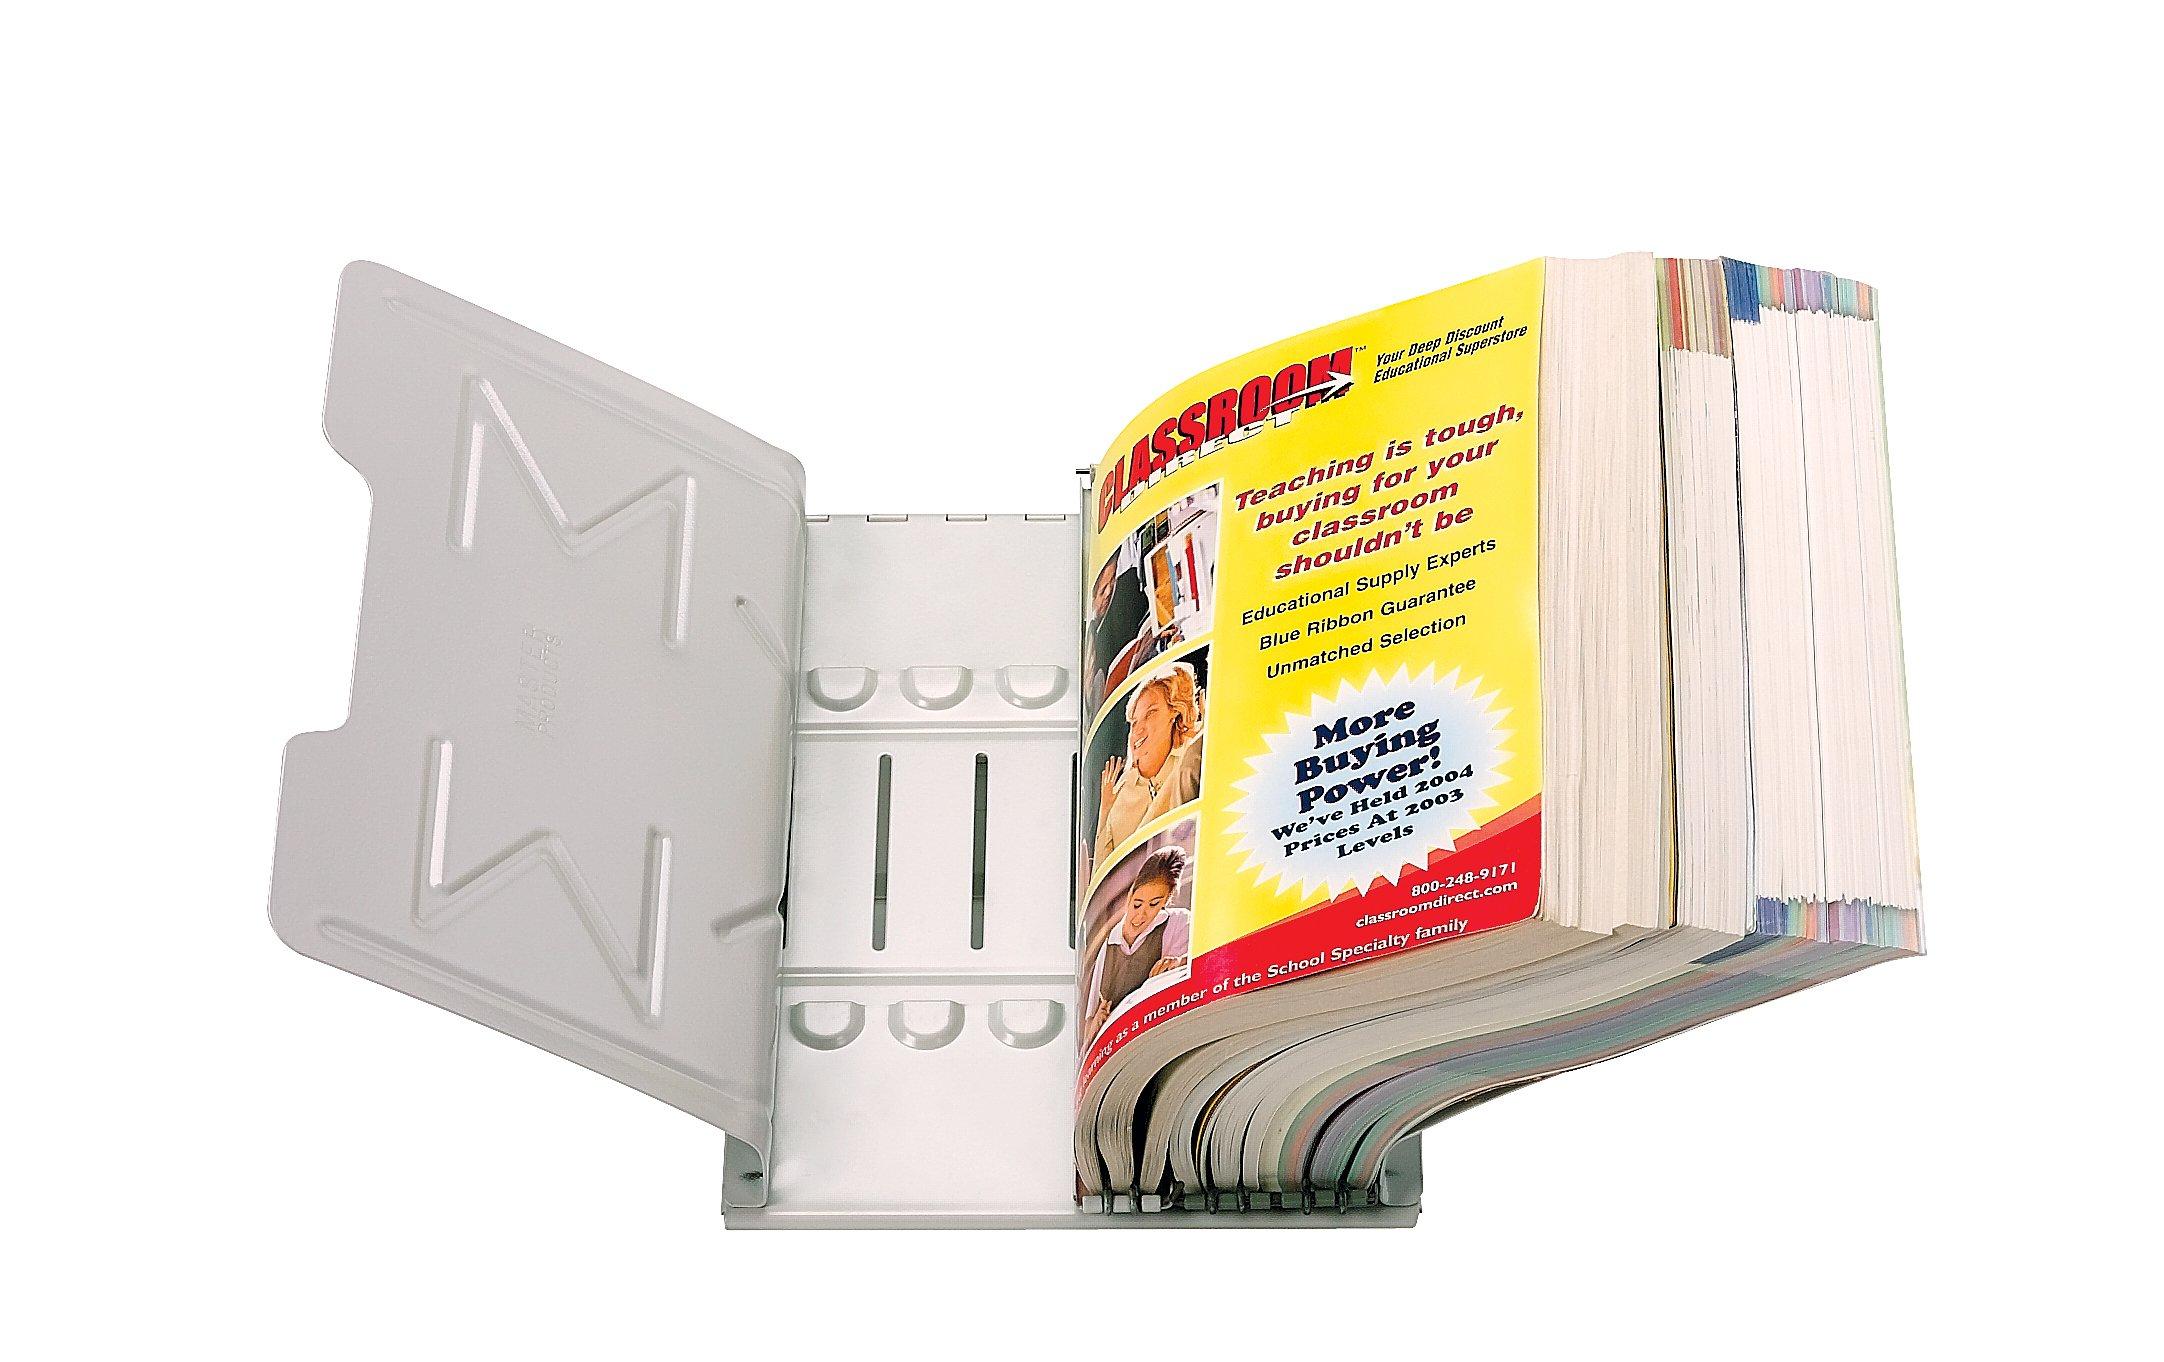 Master Catalog Rack, Organizes and Displays Catalogs/Magazines/Loose-Leaf Materials, Gray (MAT6G)